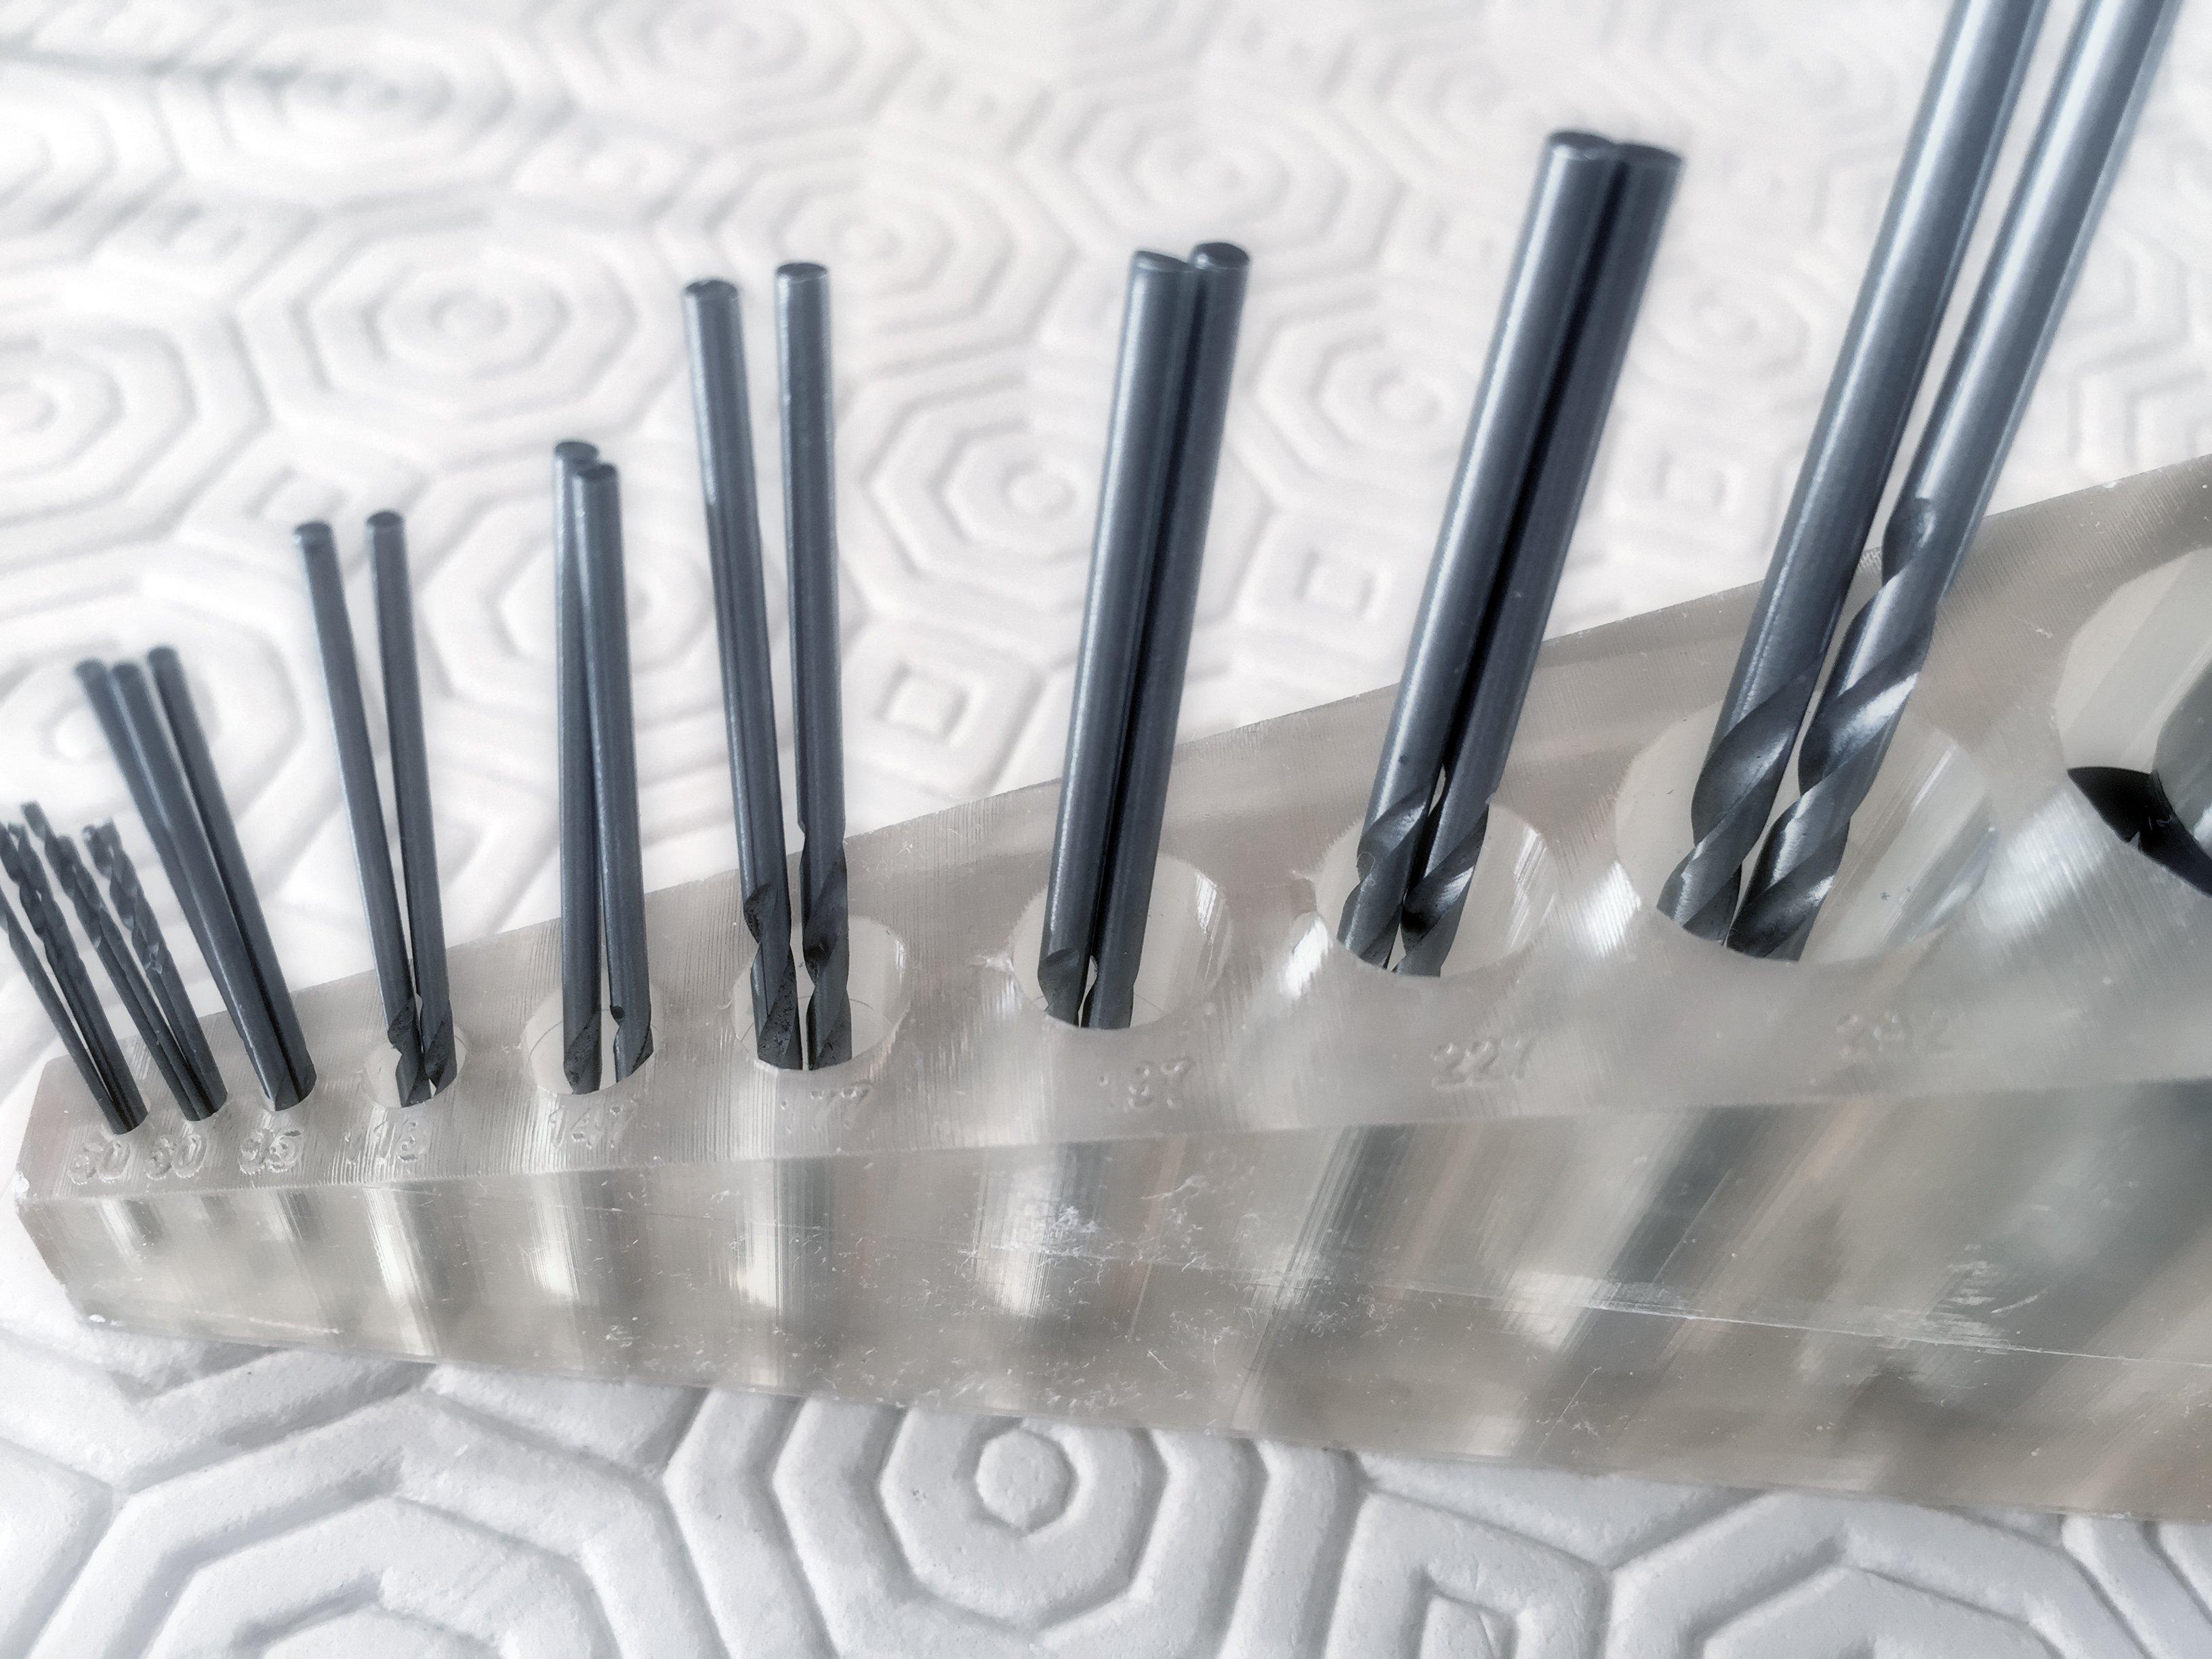 Supports for hand drill and precision drills - Support pour perceuse à main et forets de précision - Soportes para taladro manual y brocas de precisión.